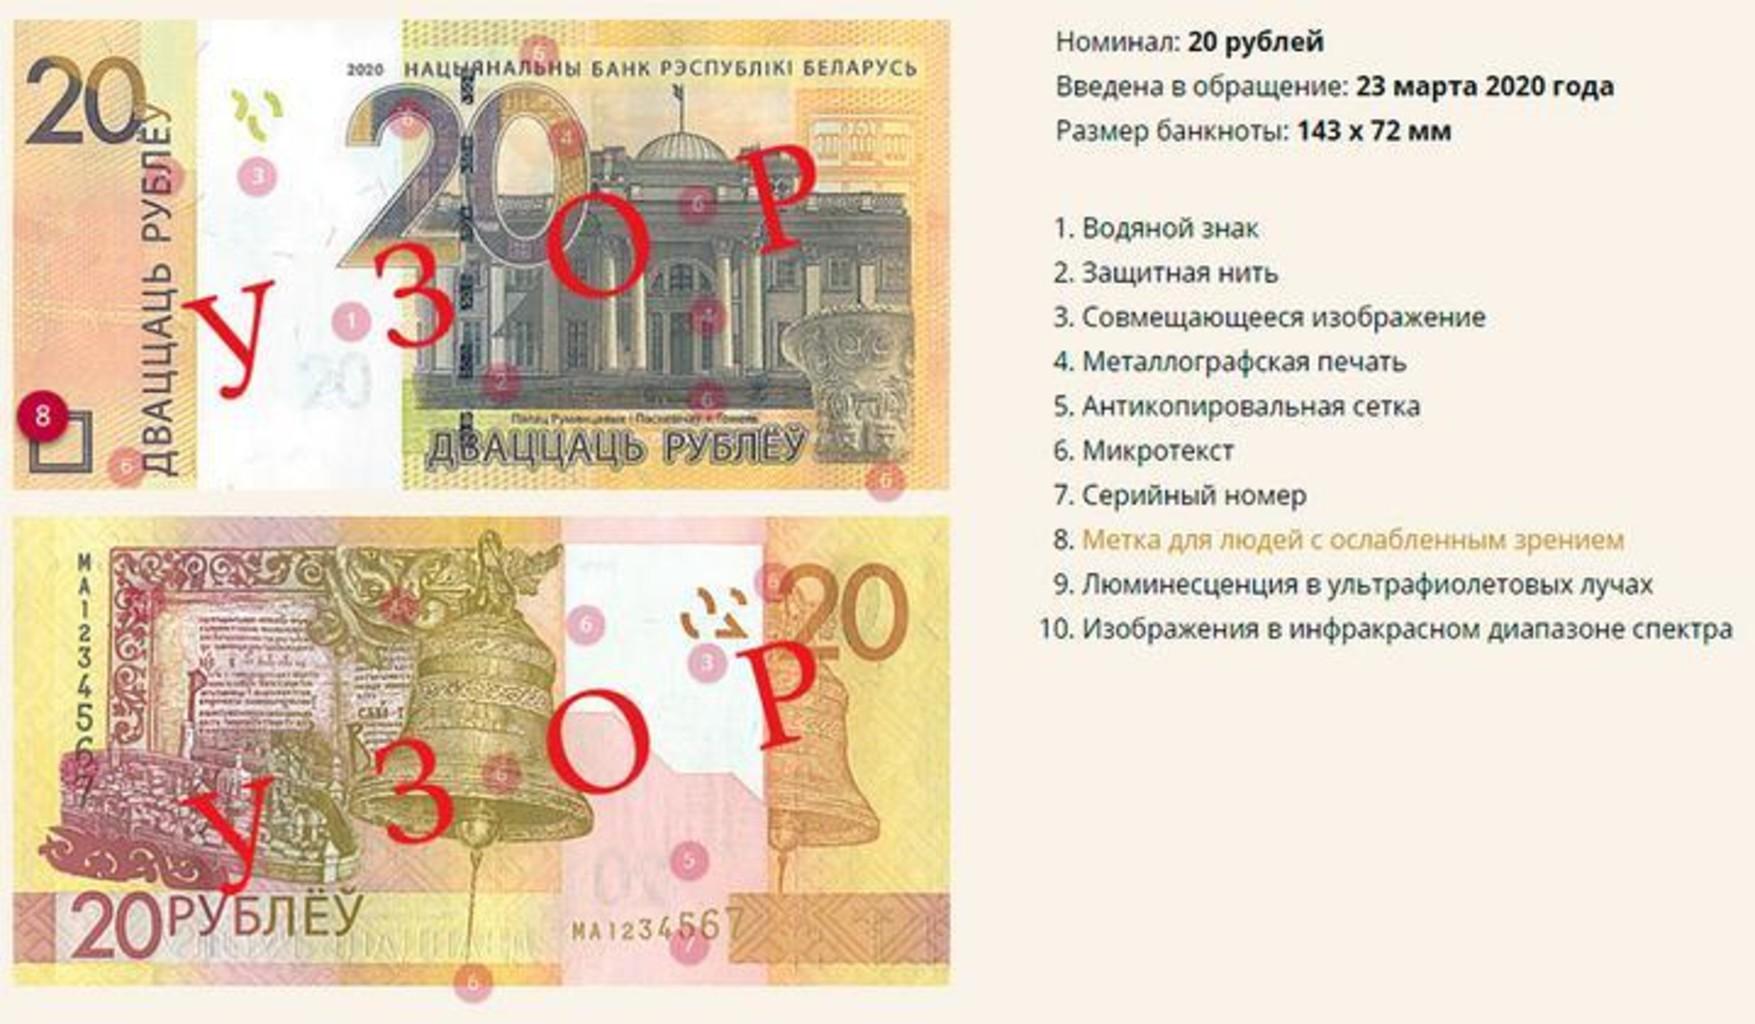 20 rubley banknota